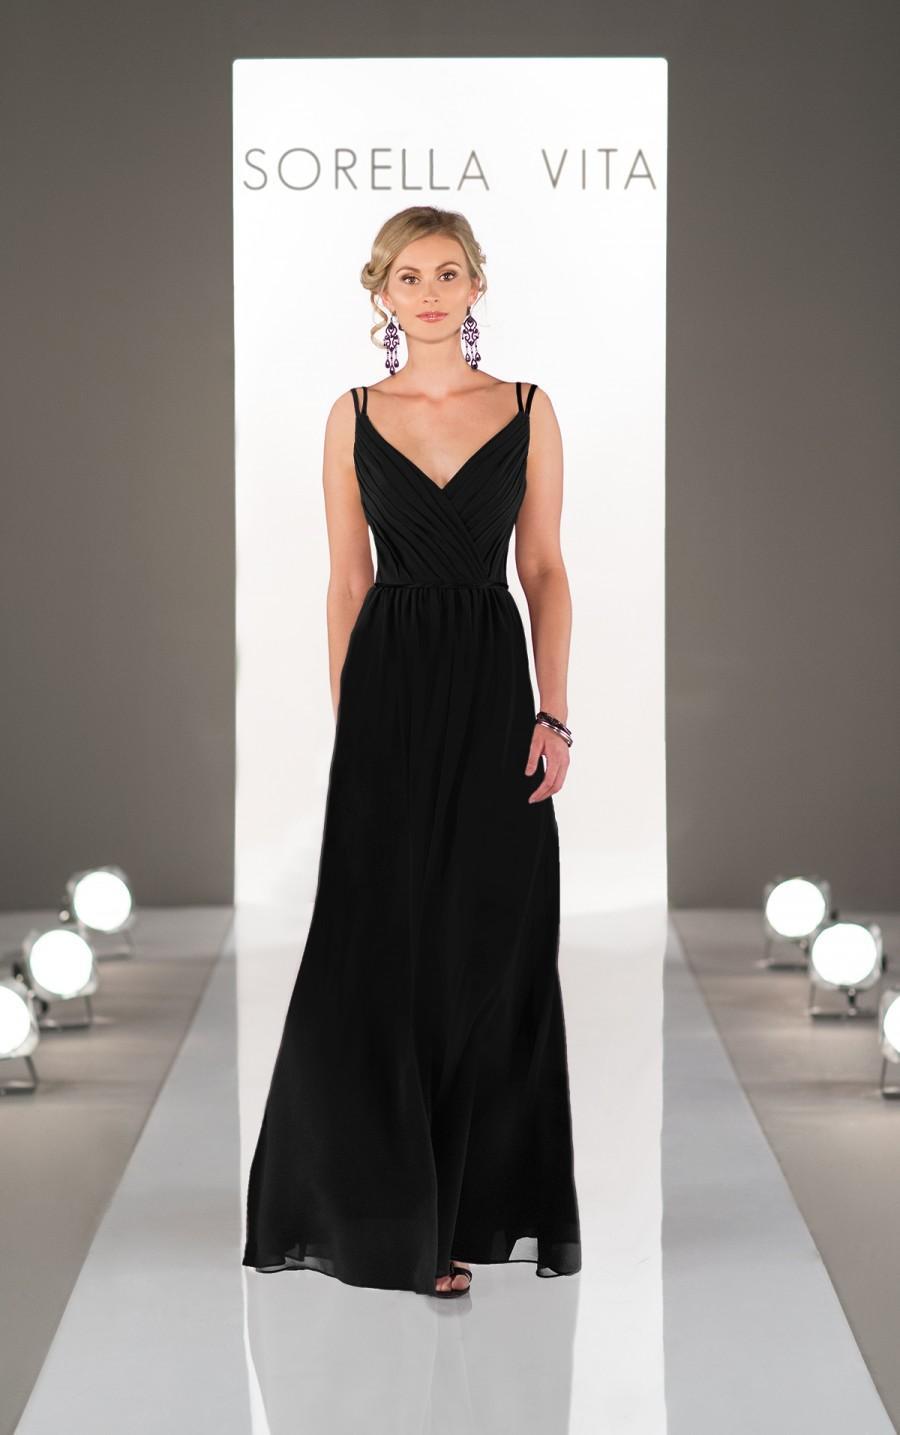 Wedding - Sorella Vita V-Neck Bridesmaid Dress Style 8614